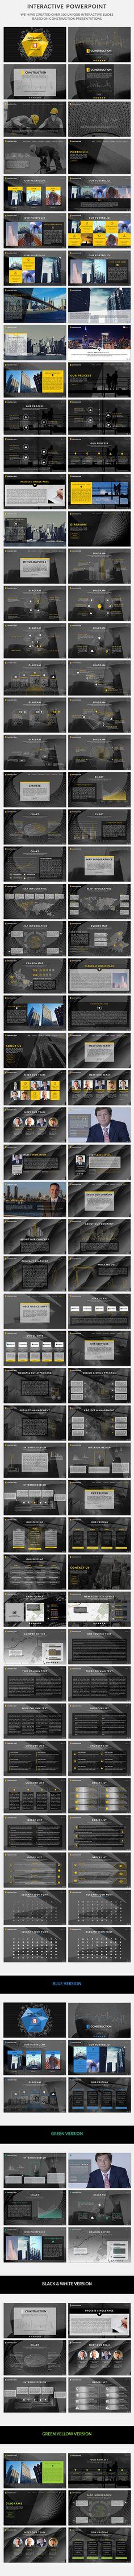 Powerpoint Slide Templates  Timeline Conservative  Timeline